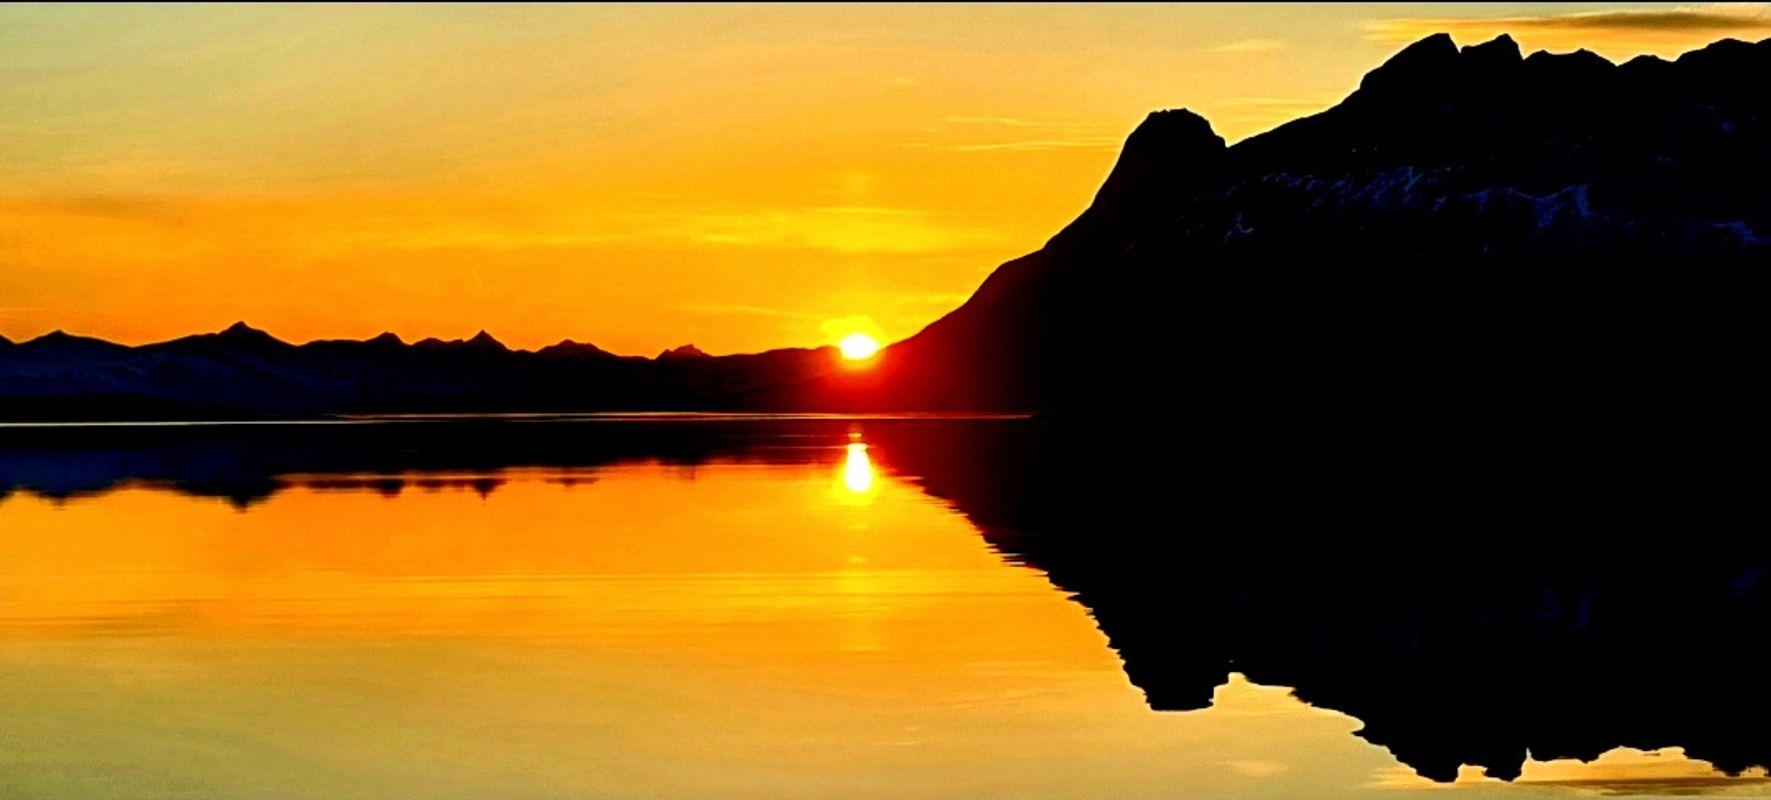 Mountain meet sea and sun